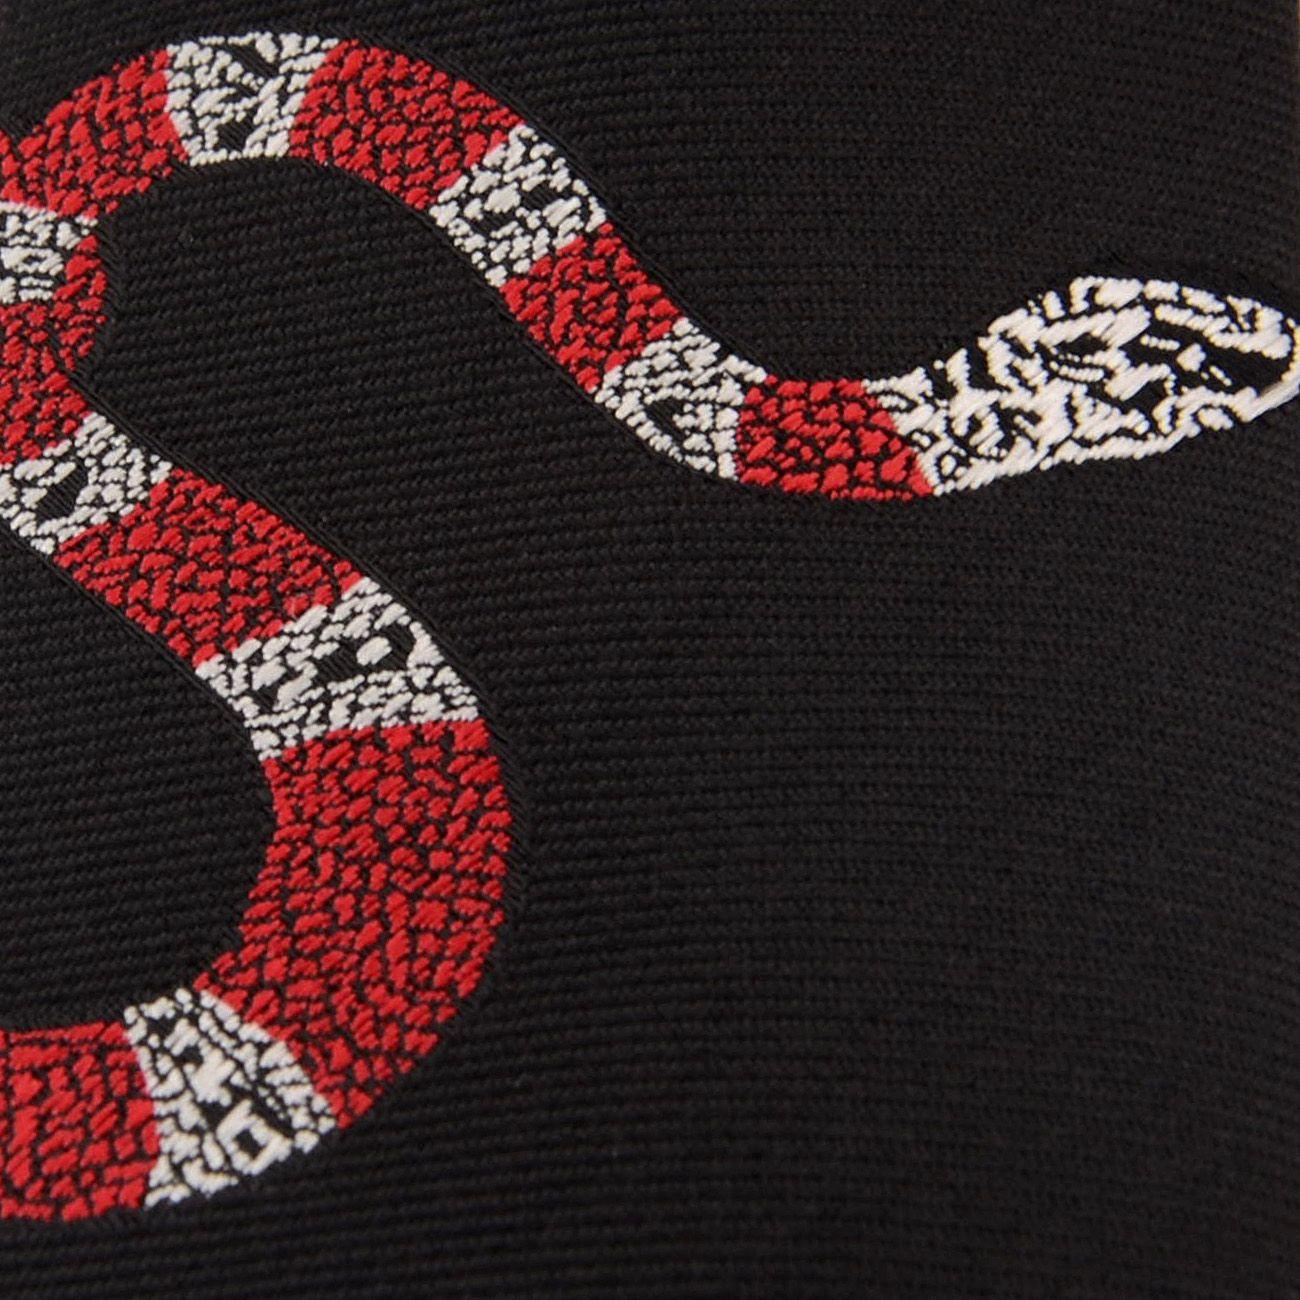 women\men fashion novelty Embroidery character animal fire red snake neck ties 6cm skinny slim Korea stropdas for heren\students